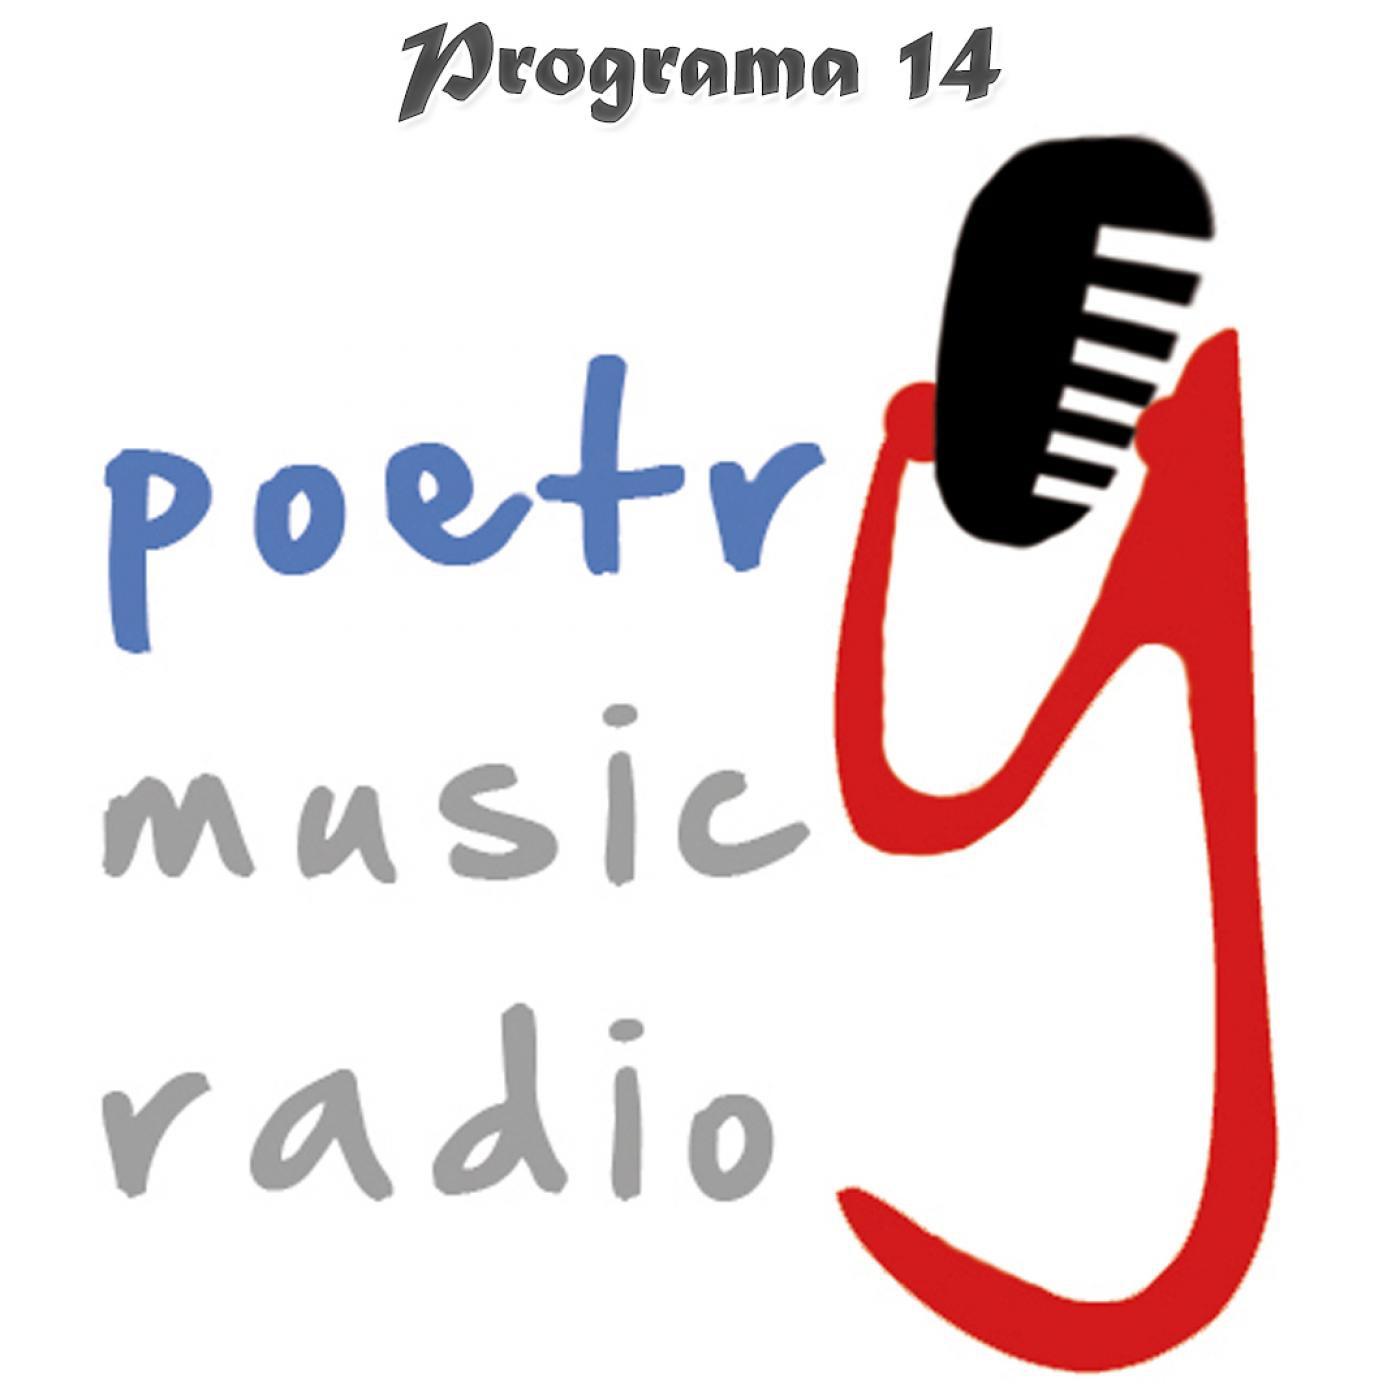 PoetryMusicRadio Programa 14 - 04.05.16